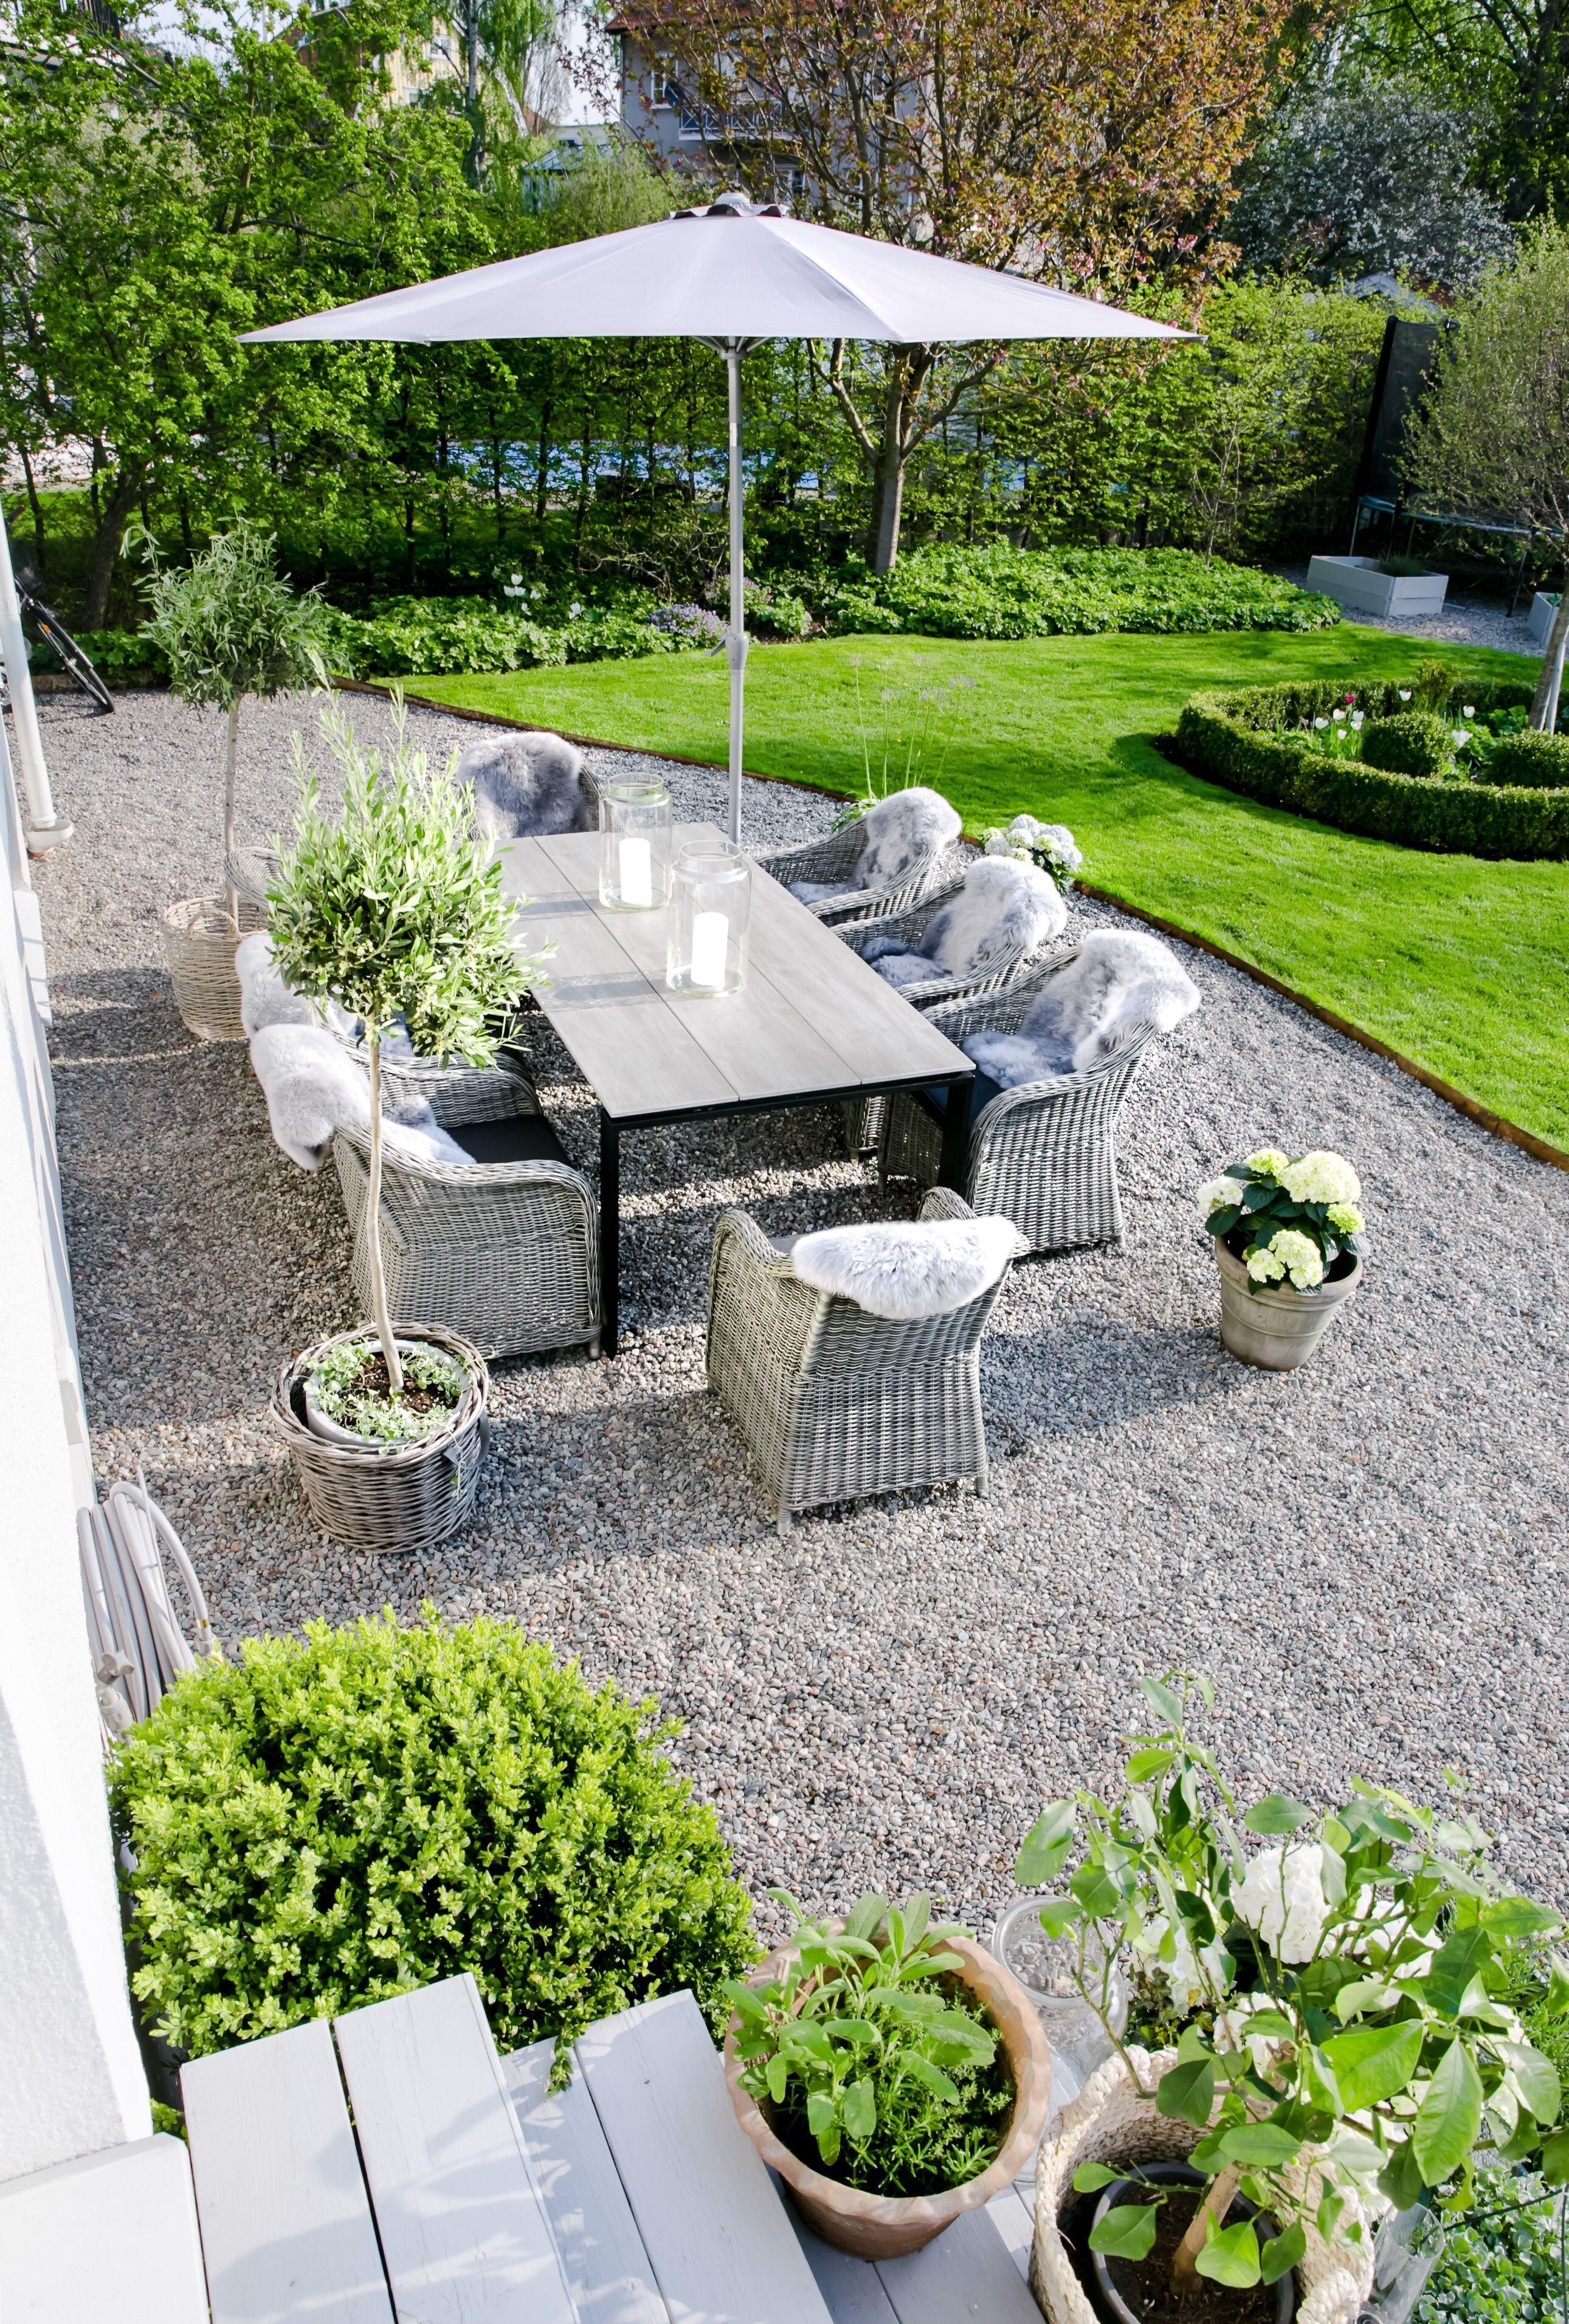 Magnificent Backyard Landscaping Ideas With Gravel Outdoor Garden Decor Backyard Garden Landscape Outdoor Gardens